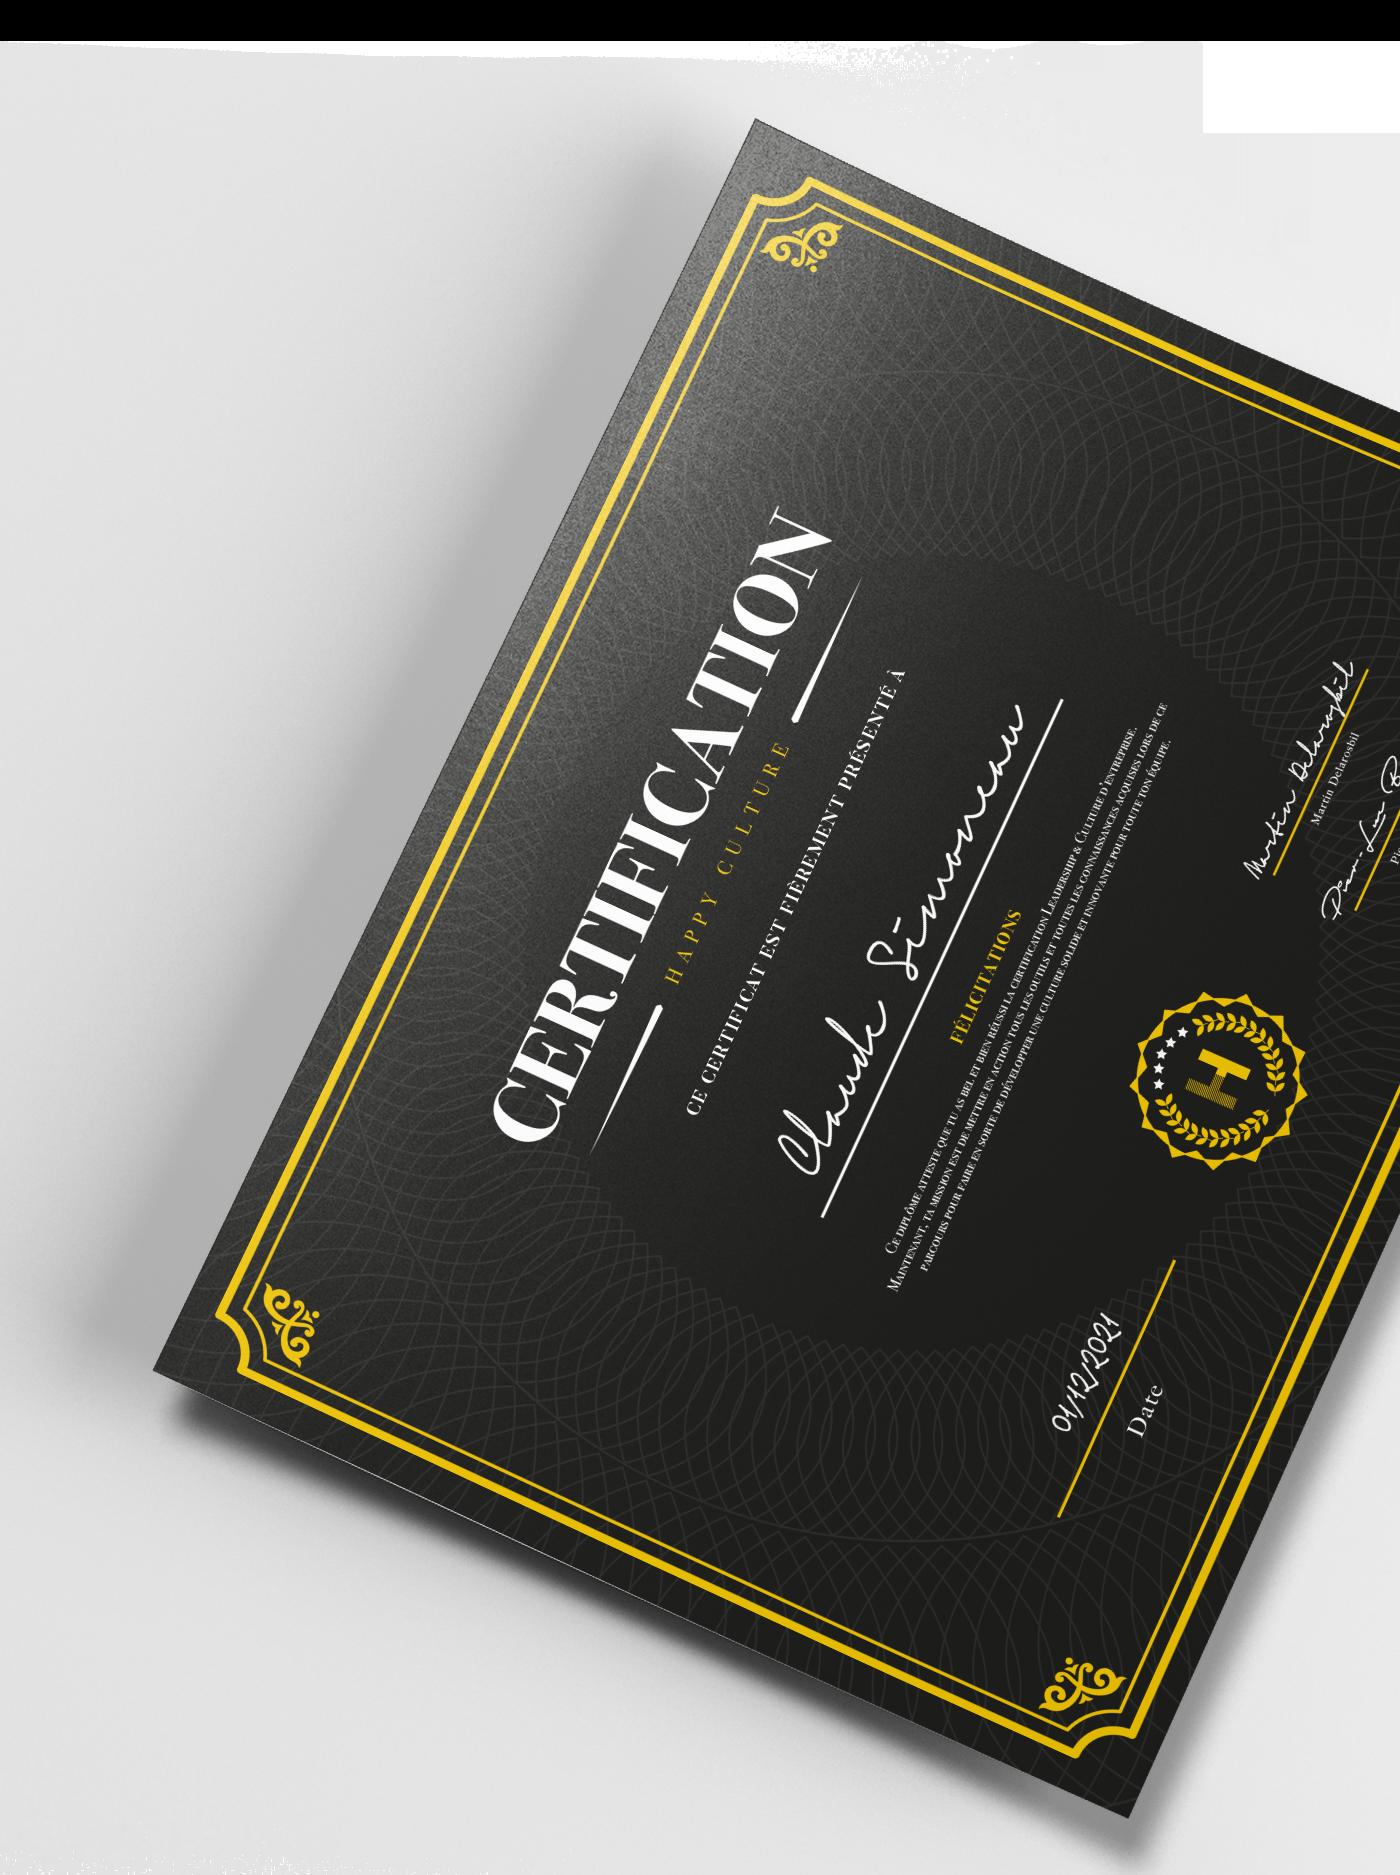 , Certification, Academie Happyculture, Academie Happyculture